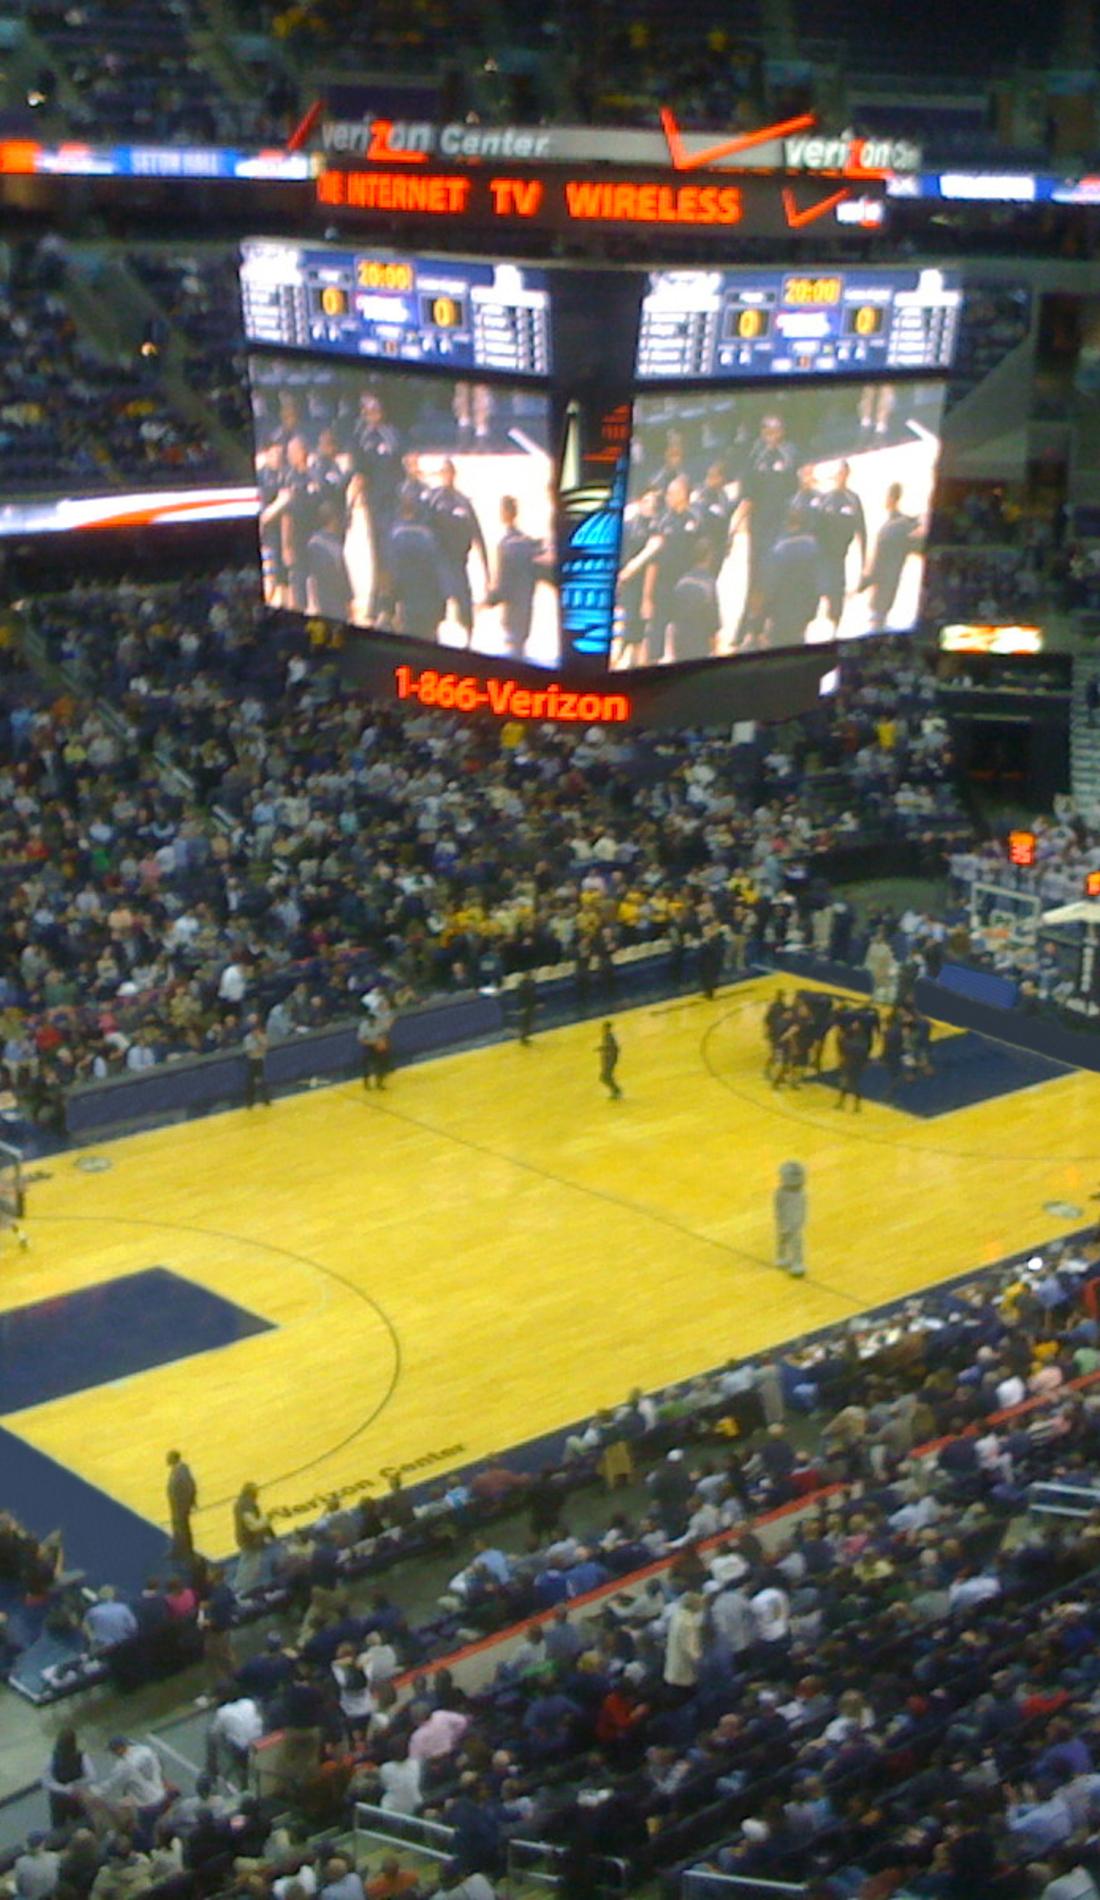 A Georgetown Hoyas Basketball live event